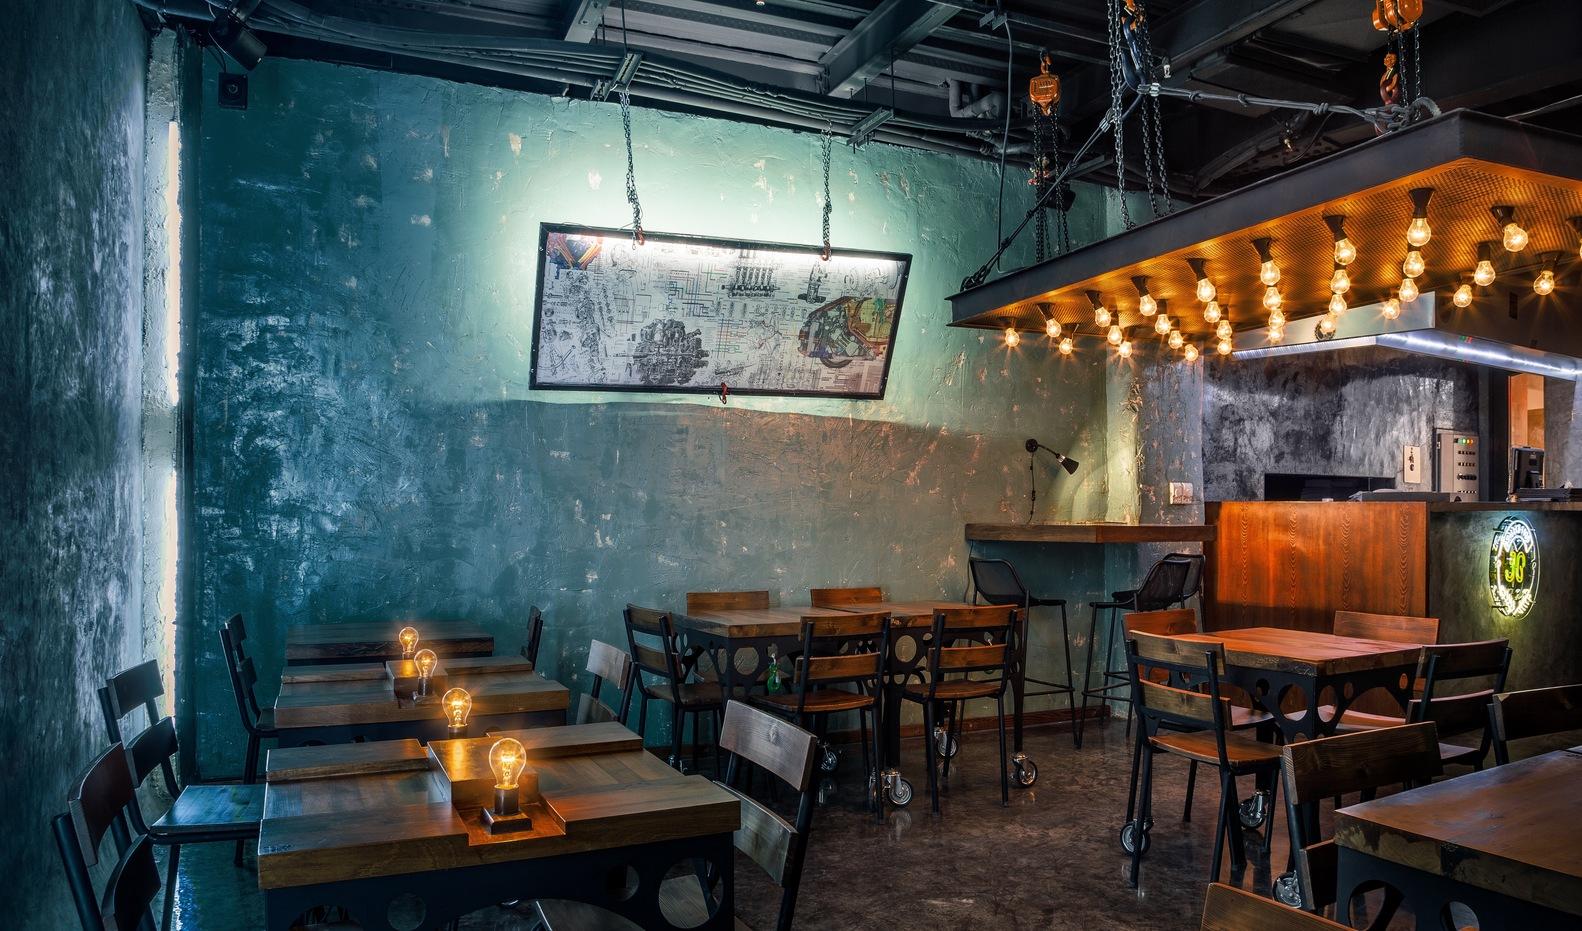 Mejor Restaurante en Medio Oriente y África: Jo Grilled Food (Teherán, Irán) / WhiteRhino Design Group